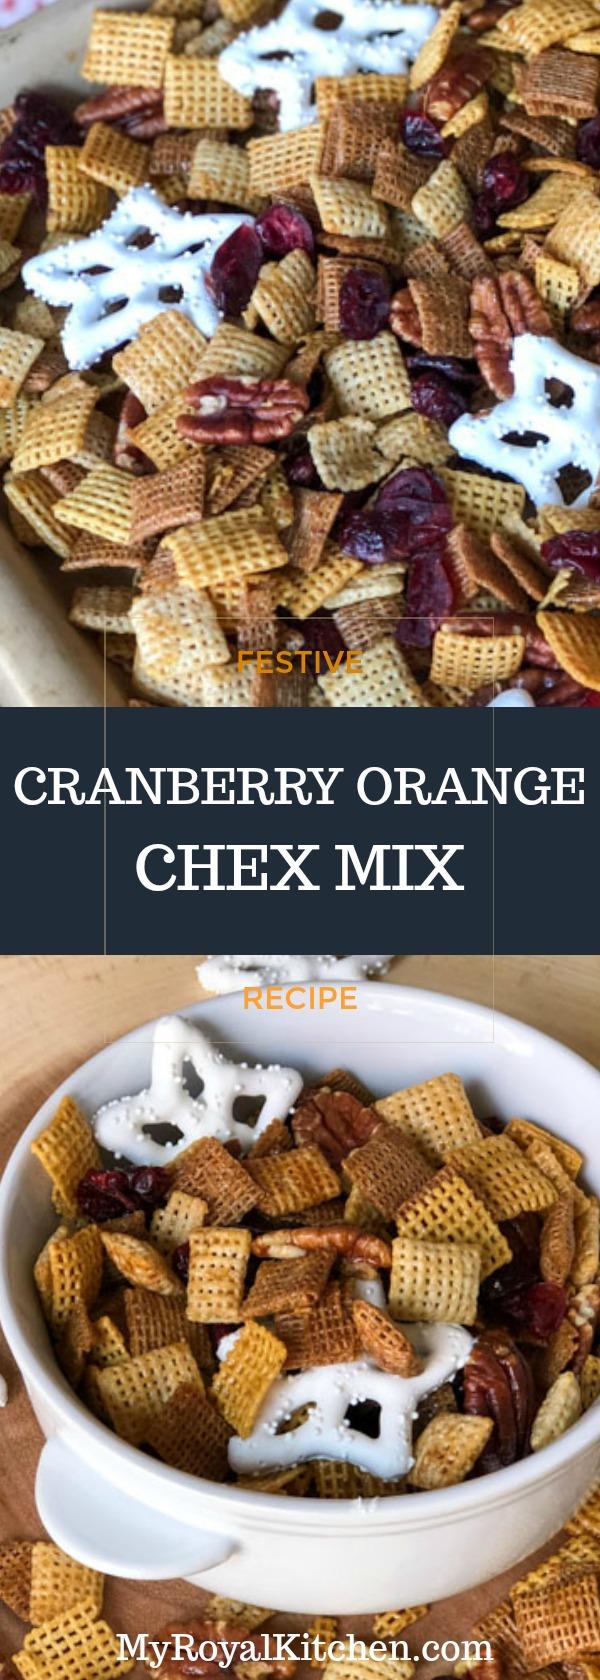 FESTIVE CRANBERRY ORANGE CHEX MIX PINTEREST